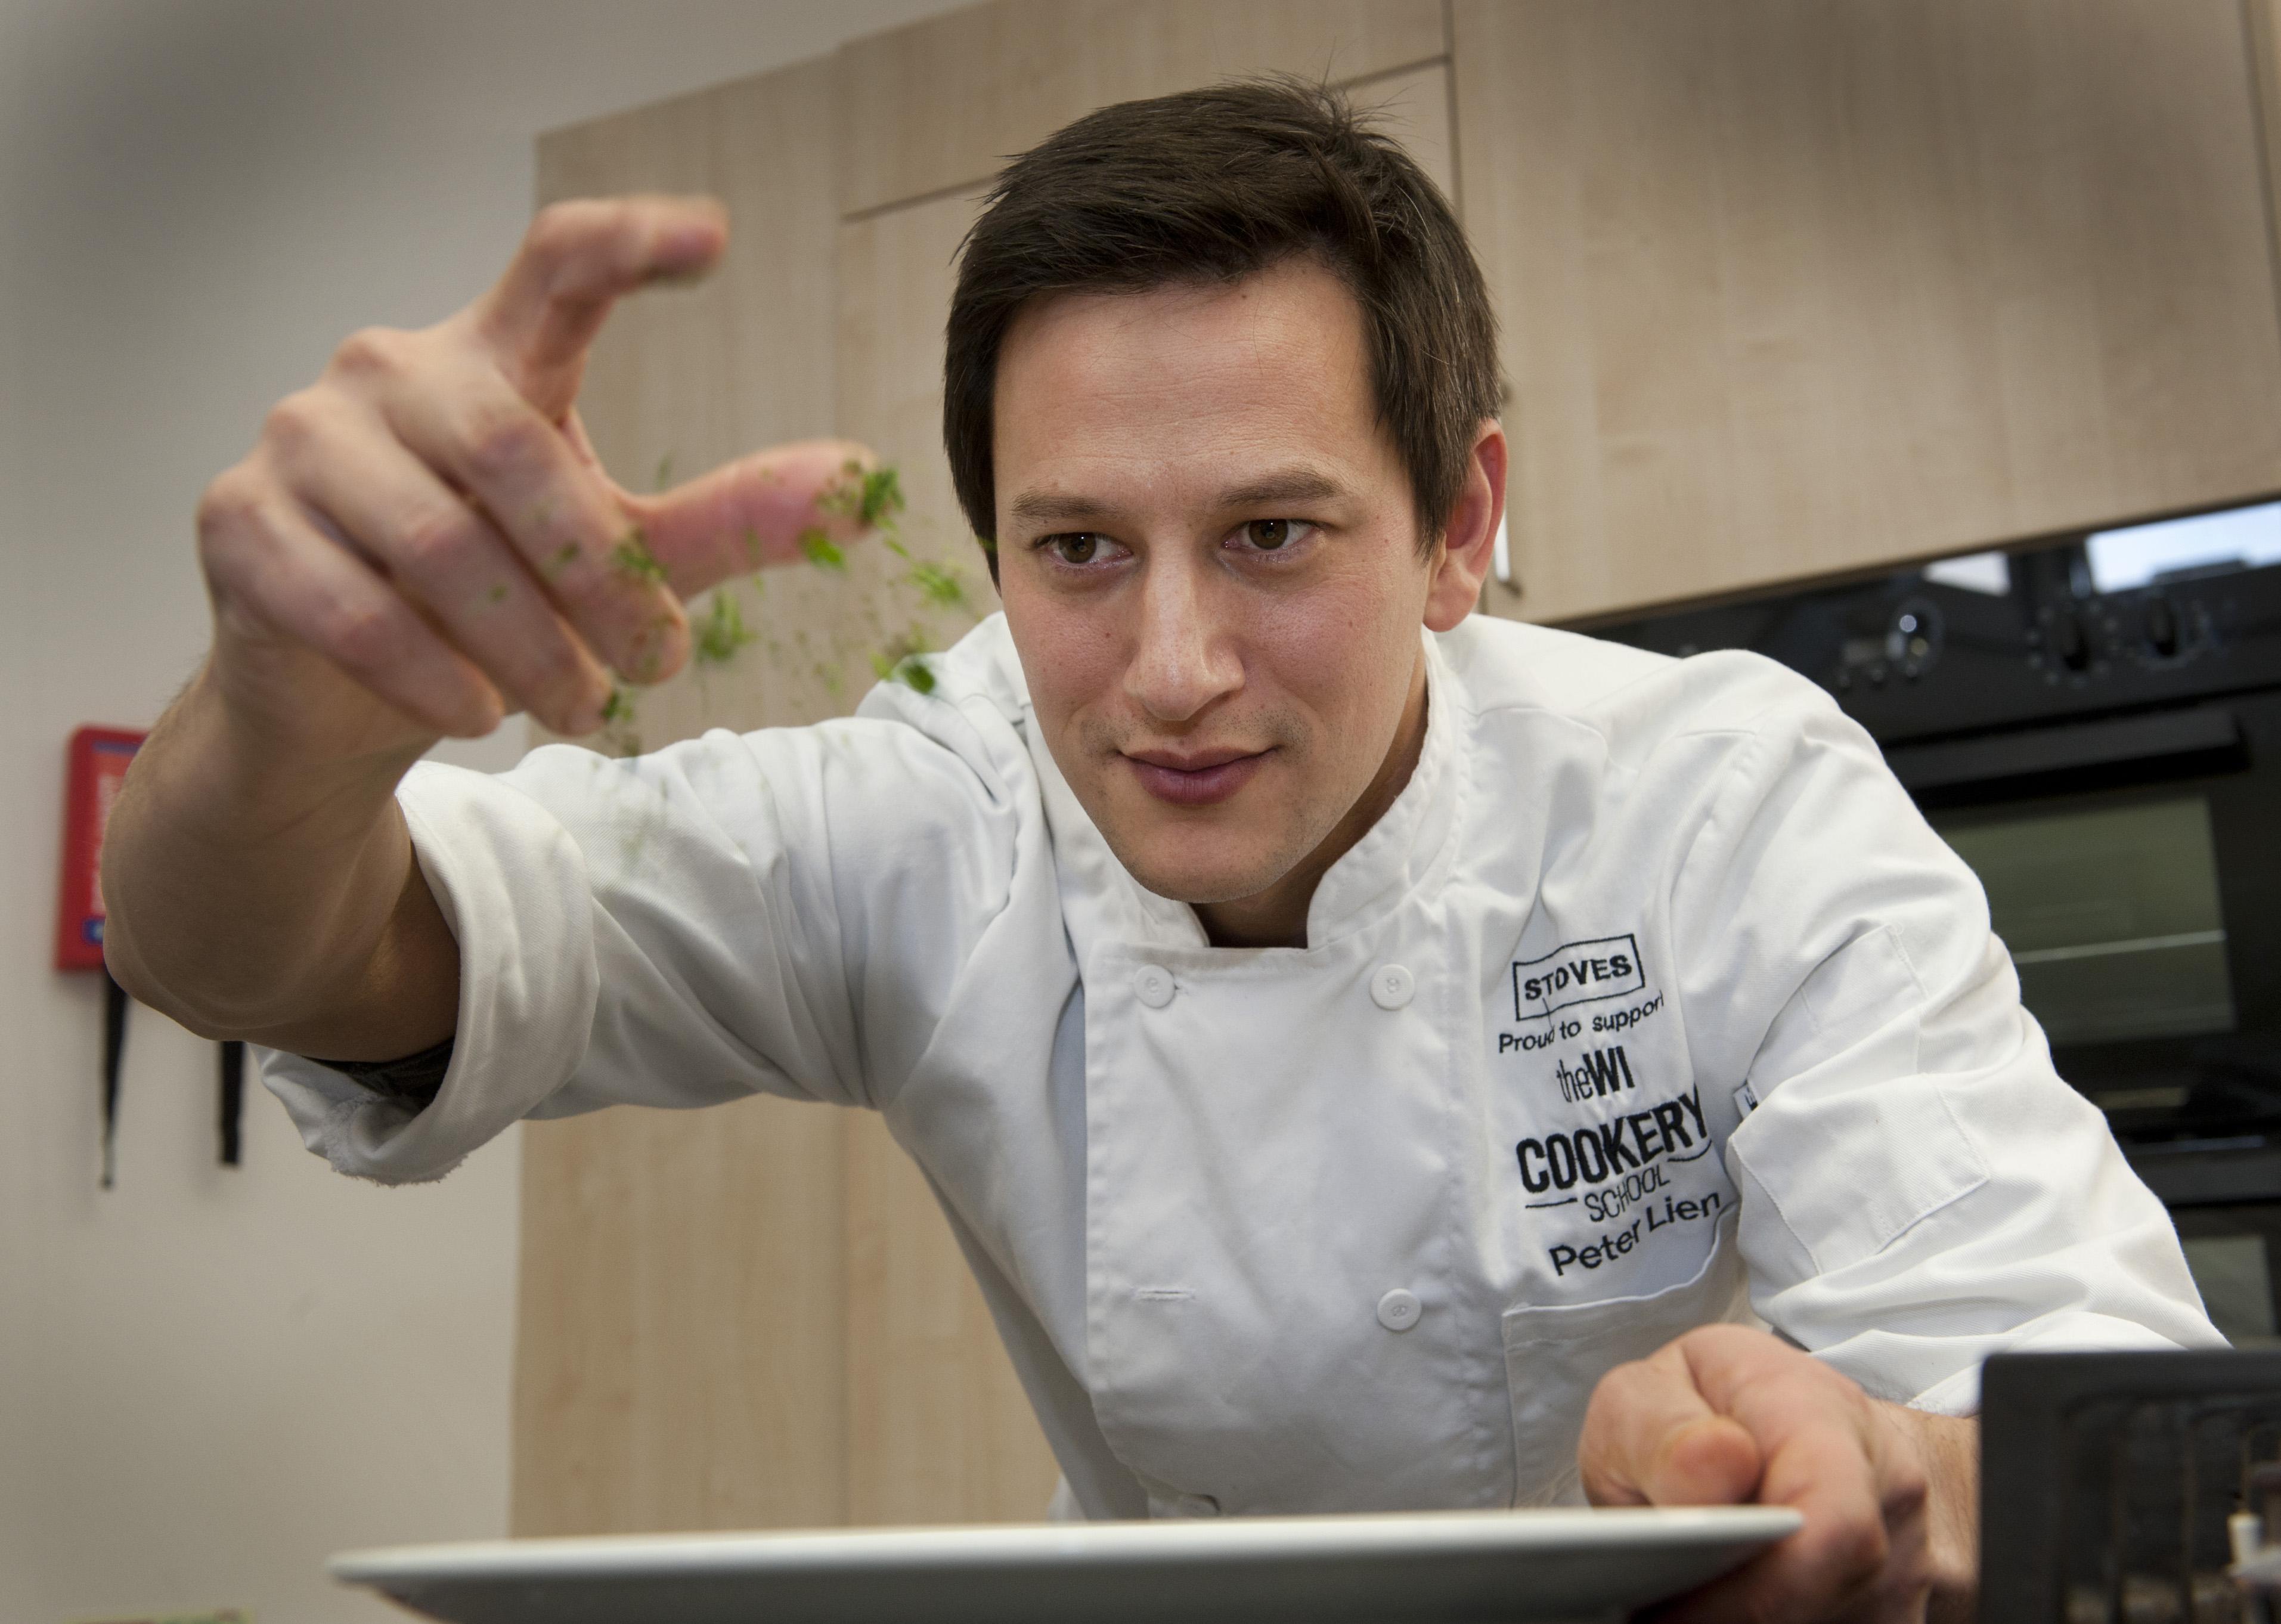 Knife Skills - Day School : Peter Lien